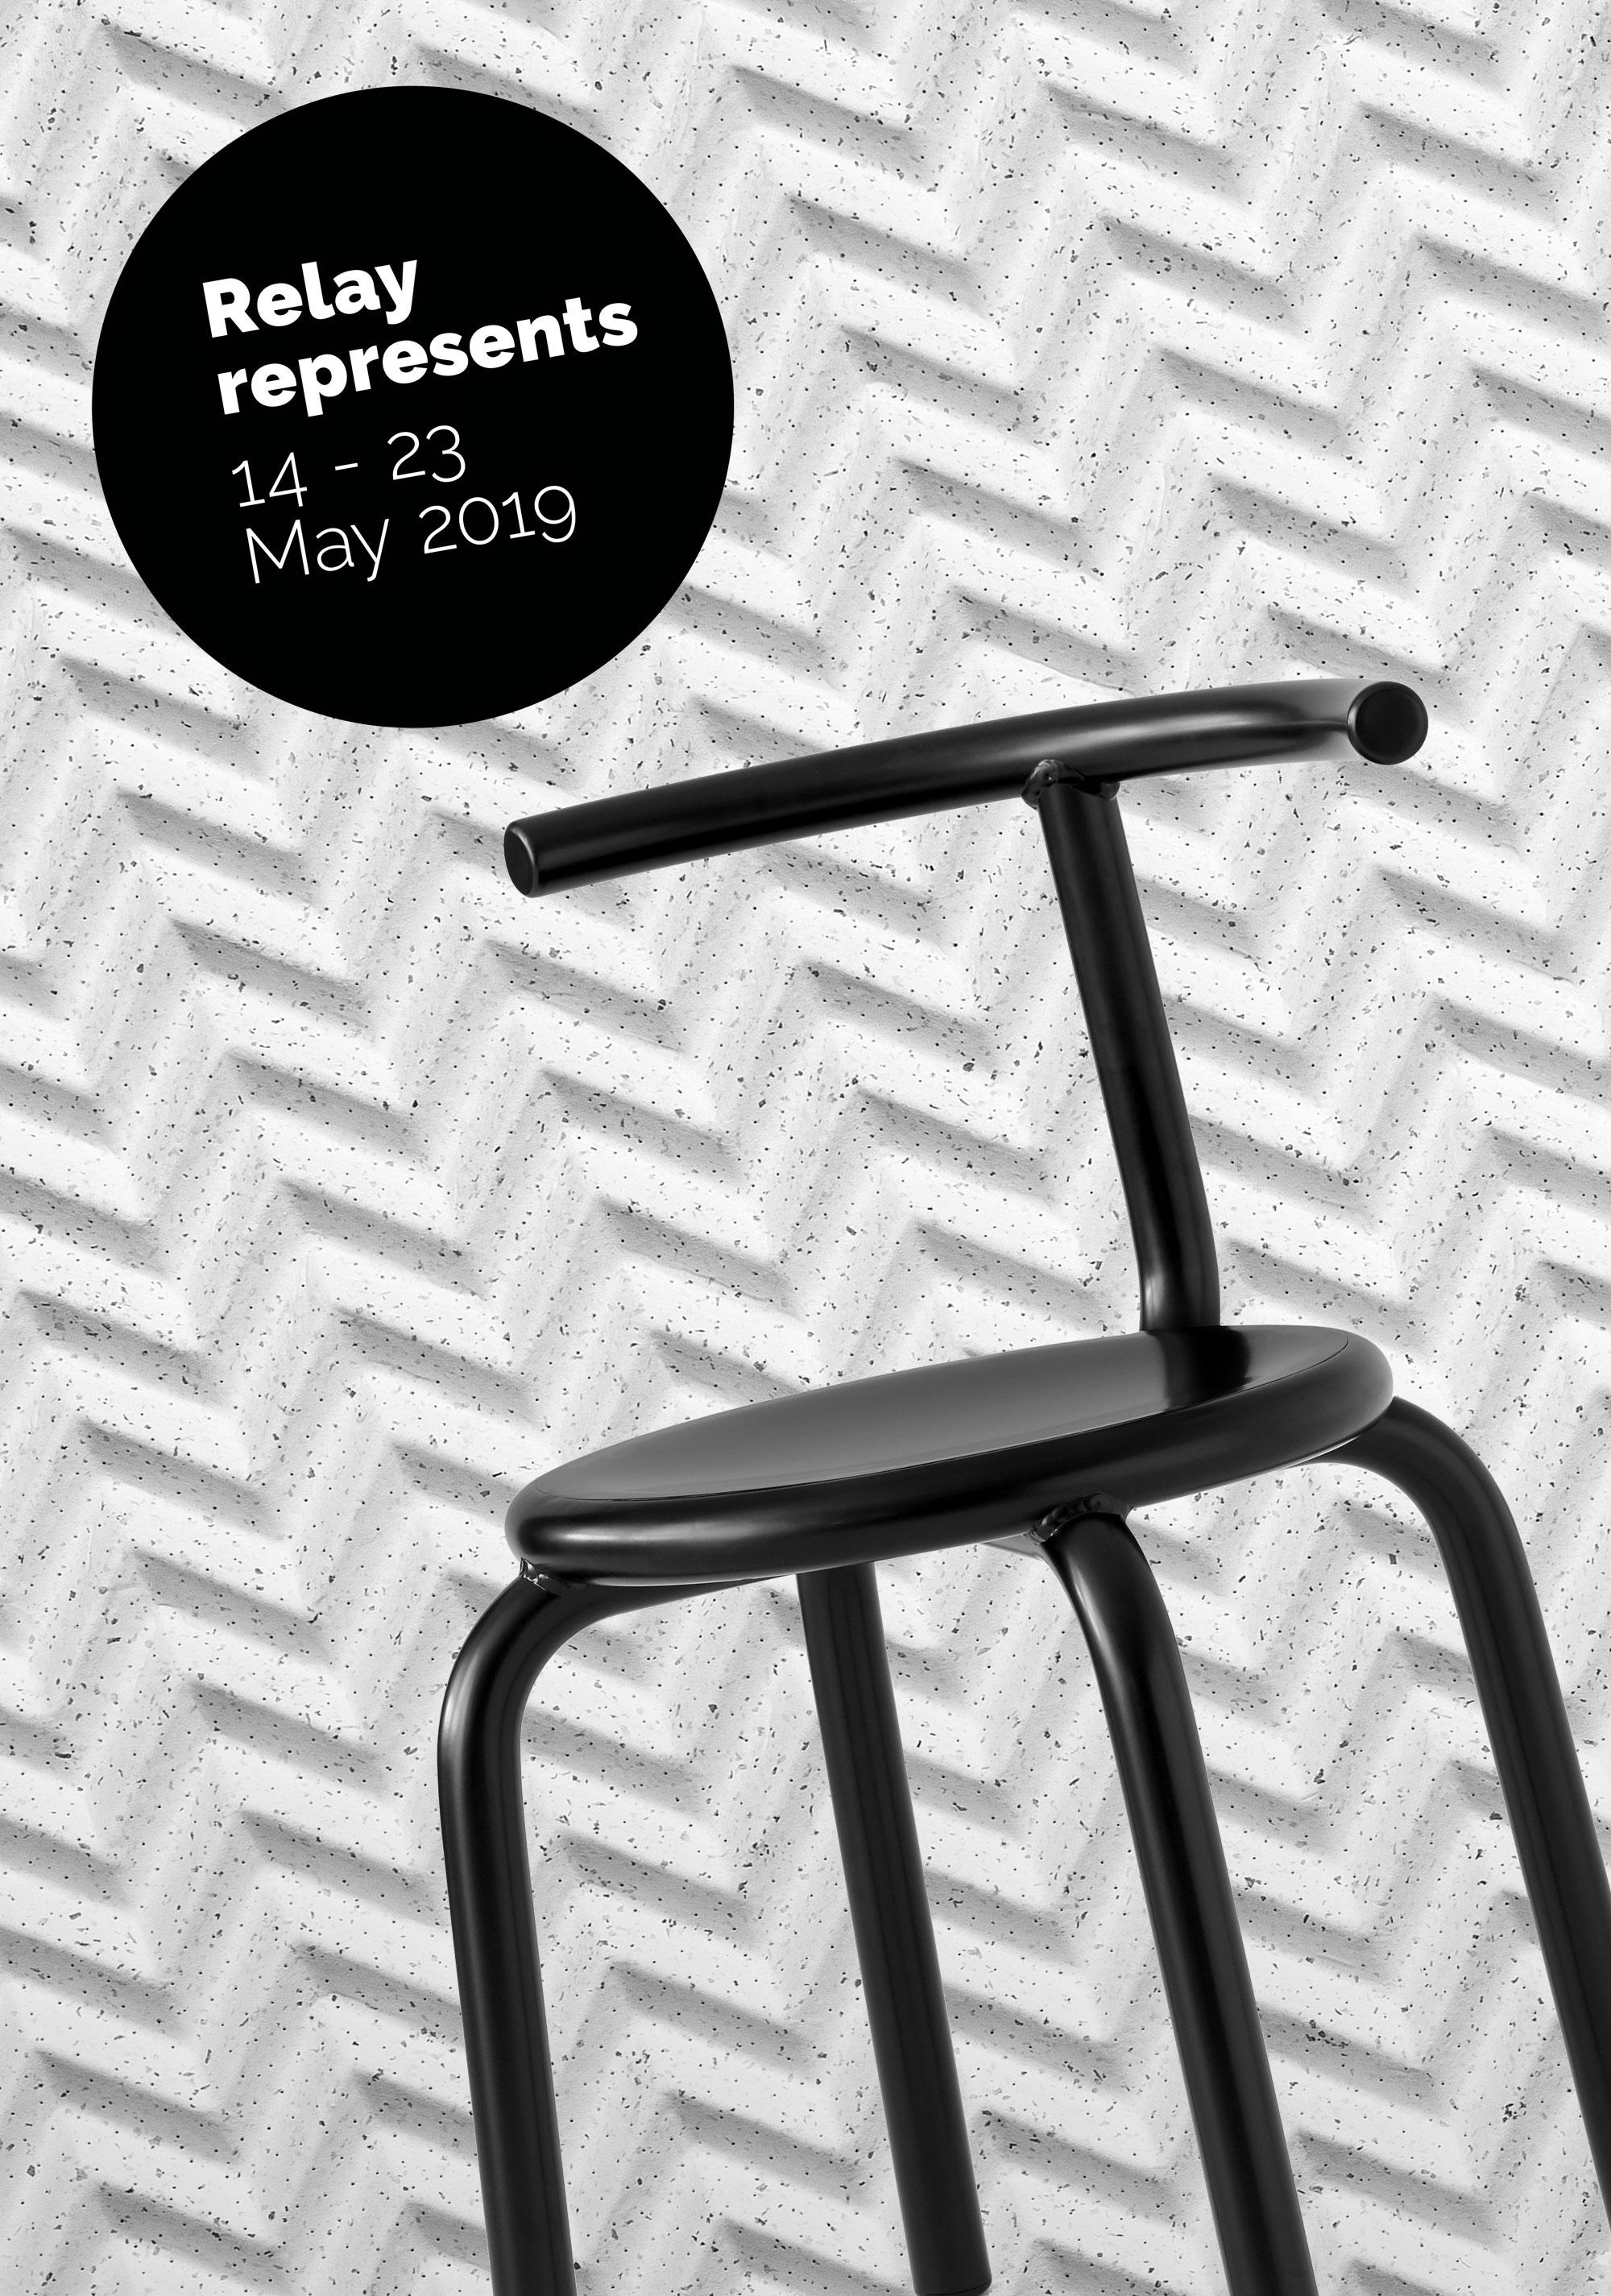 Relay-RepresentsB.jpg